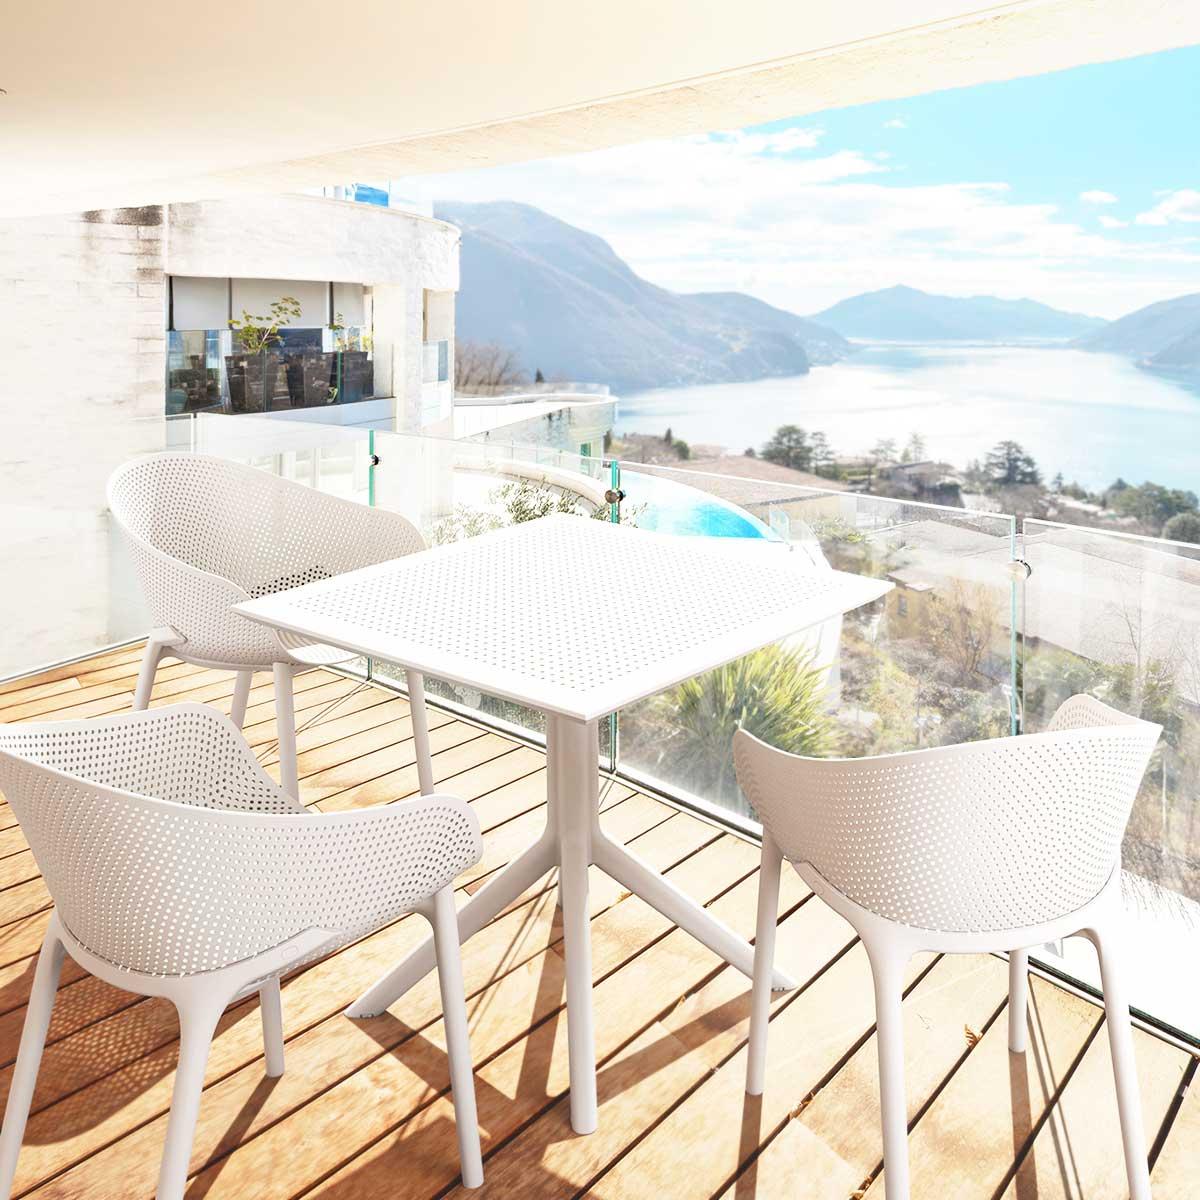 Salon de jardin SKY blanc 4 places en polypropylène - Siesta